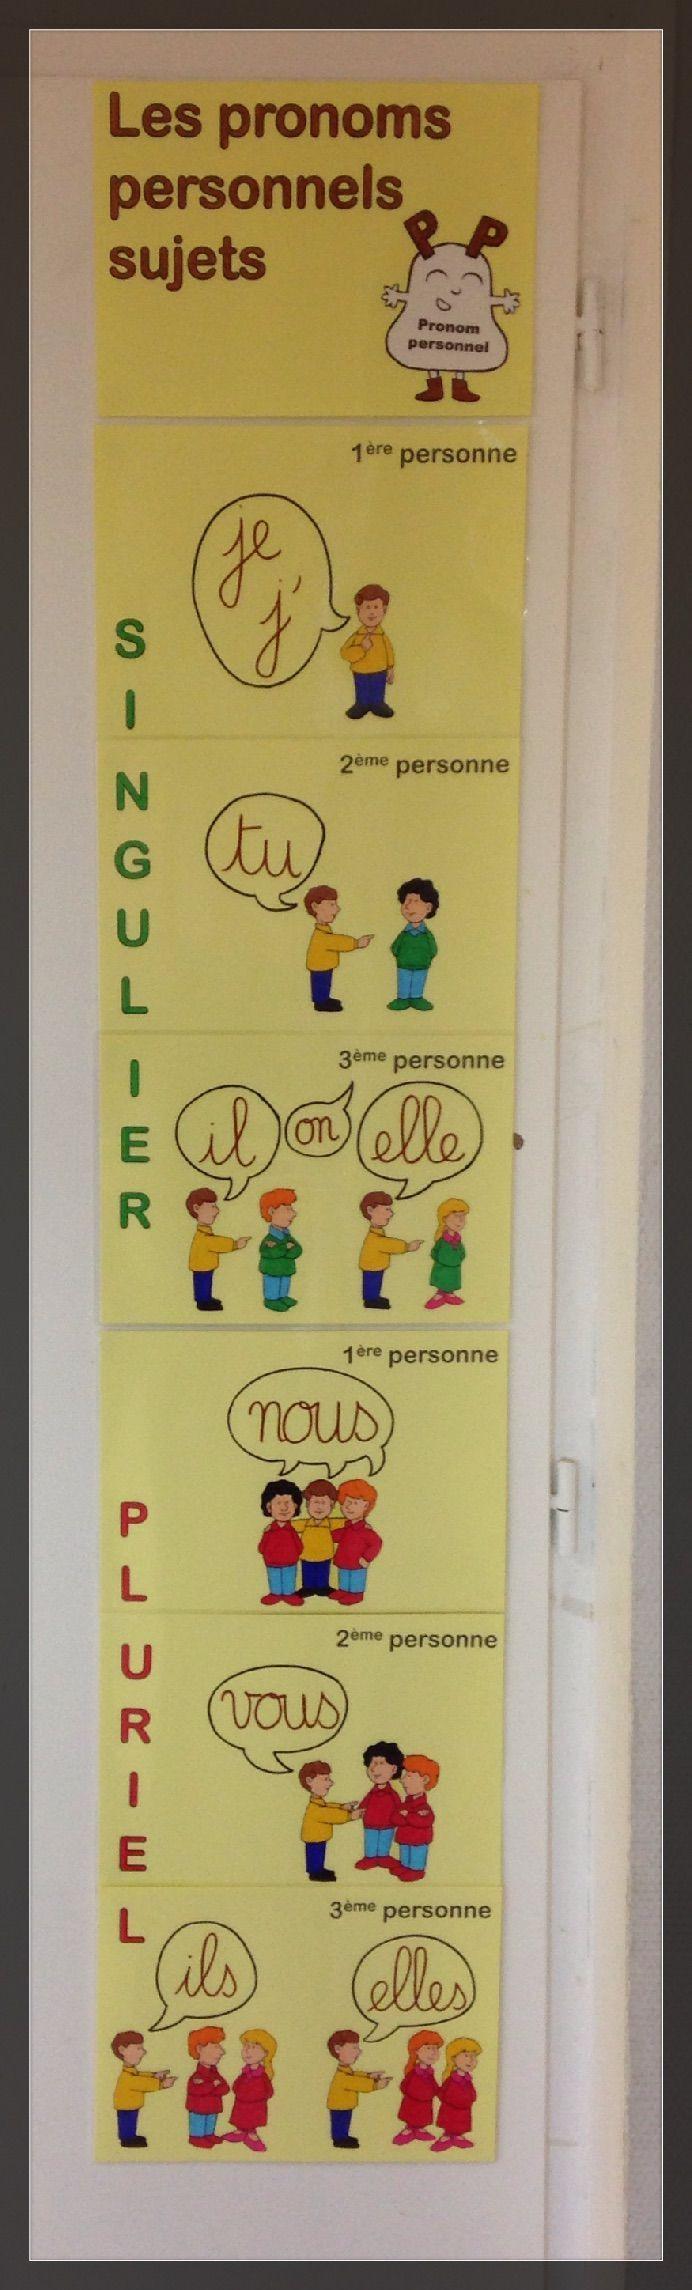 Montrer En Espagnol Conjugaison